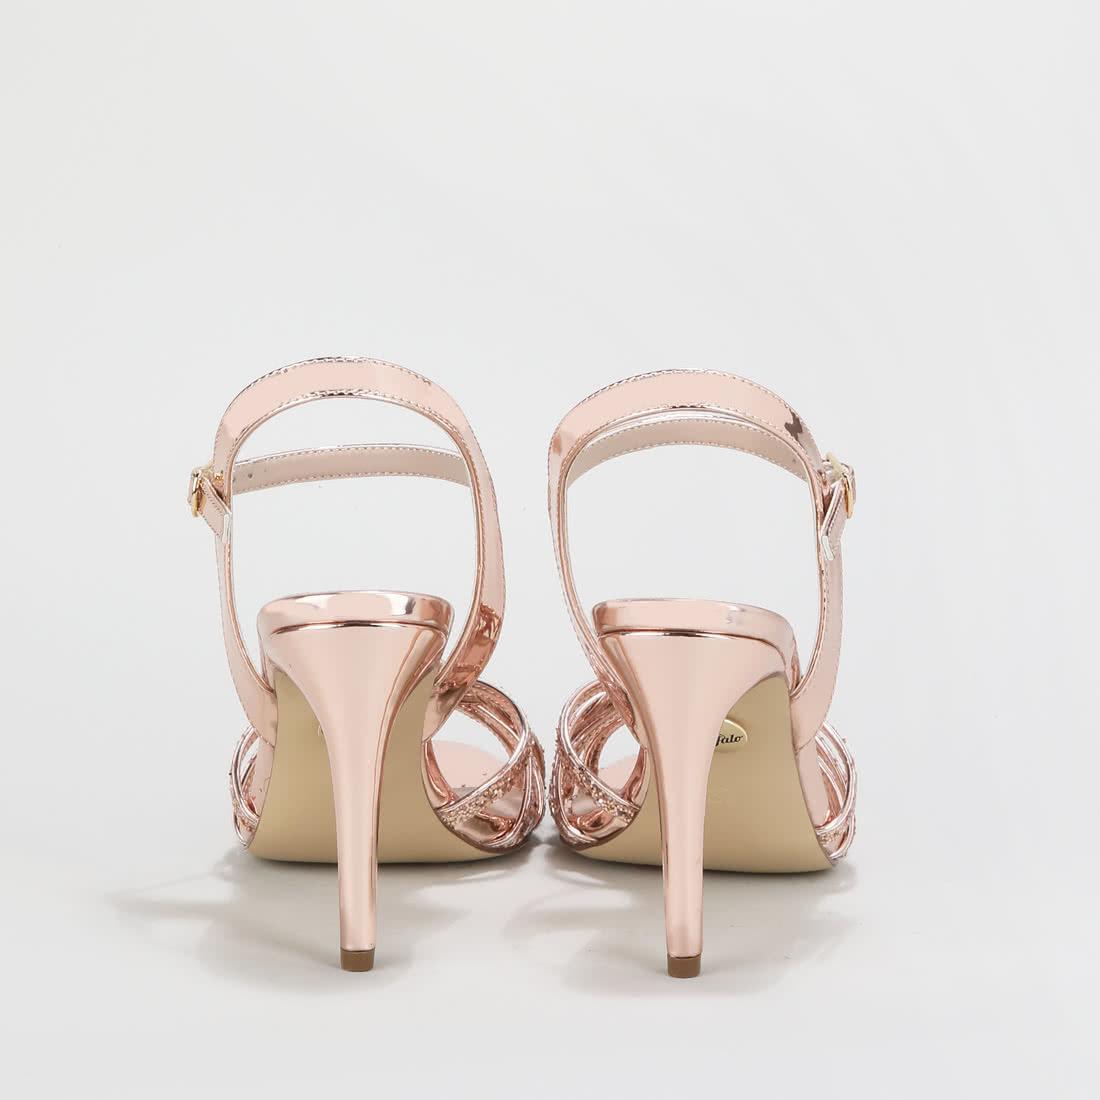 Rosé KaufenBuffalo® Metallic Afterglow Sandalette Online YWE9DH2I